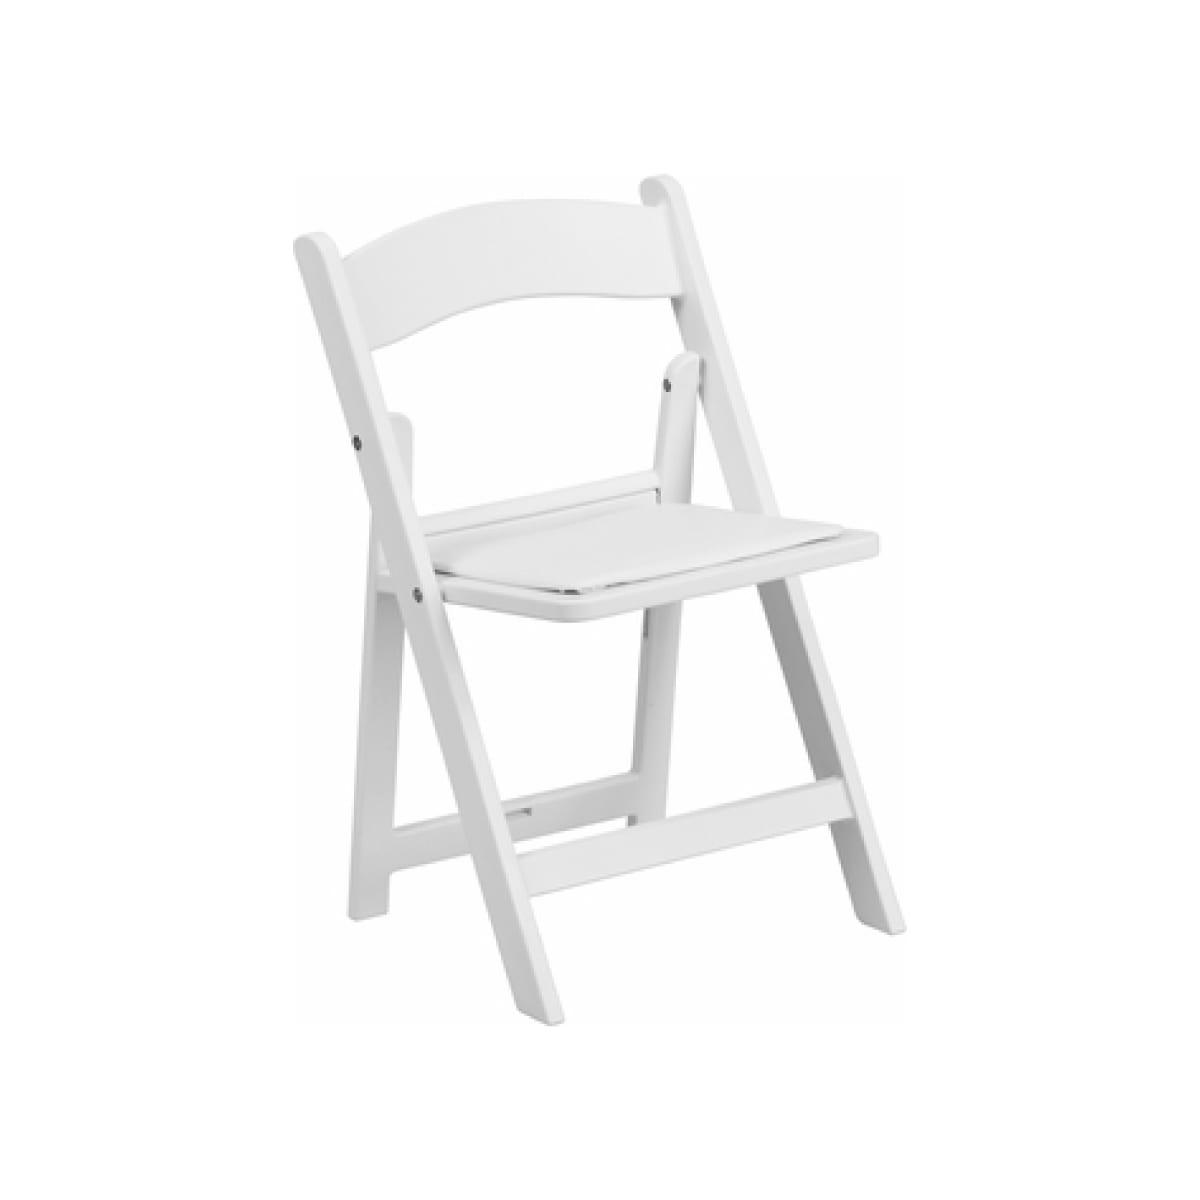 Kid White Resin Chair